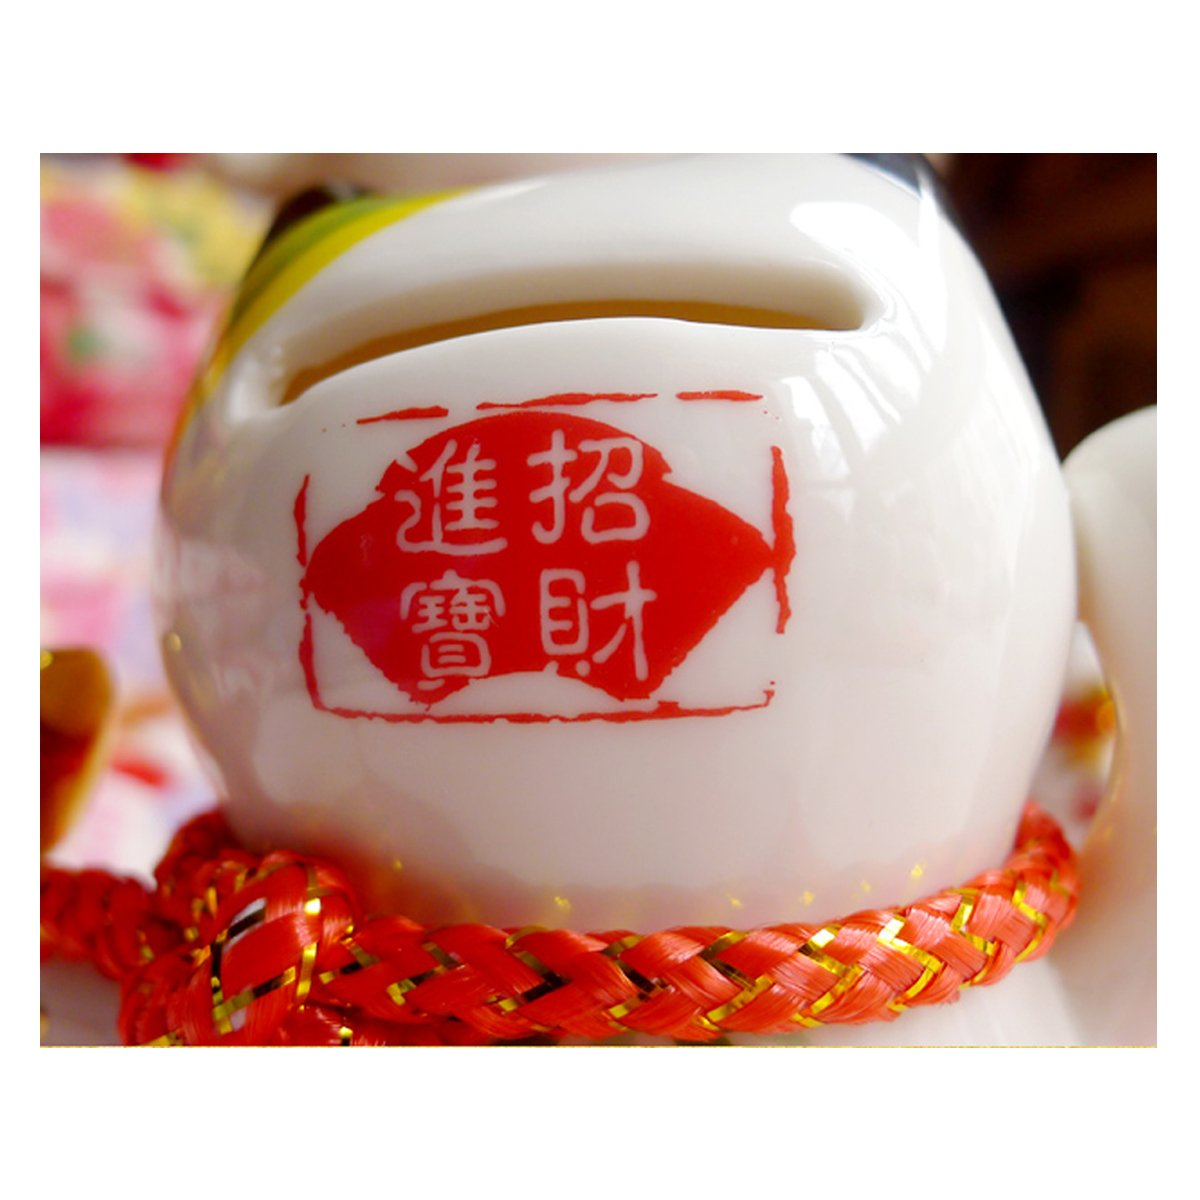 4 White Ceramic Maneki Neko Lucky Cat Coin Bank 4 PCS SET